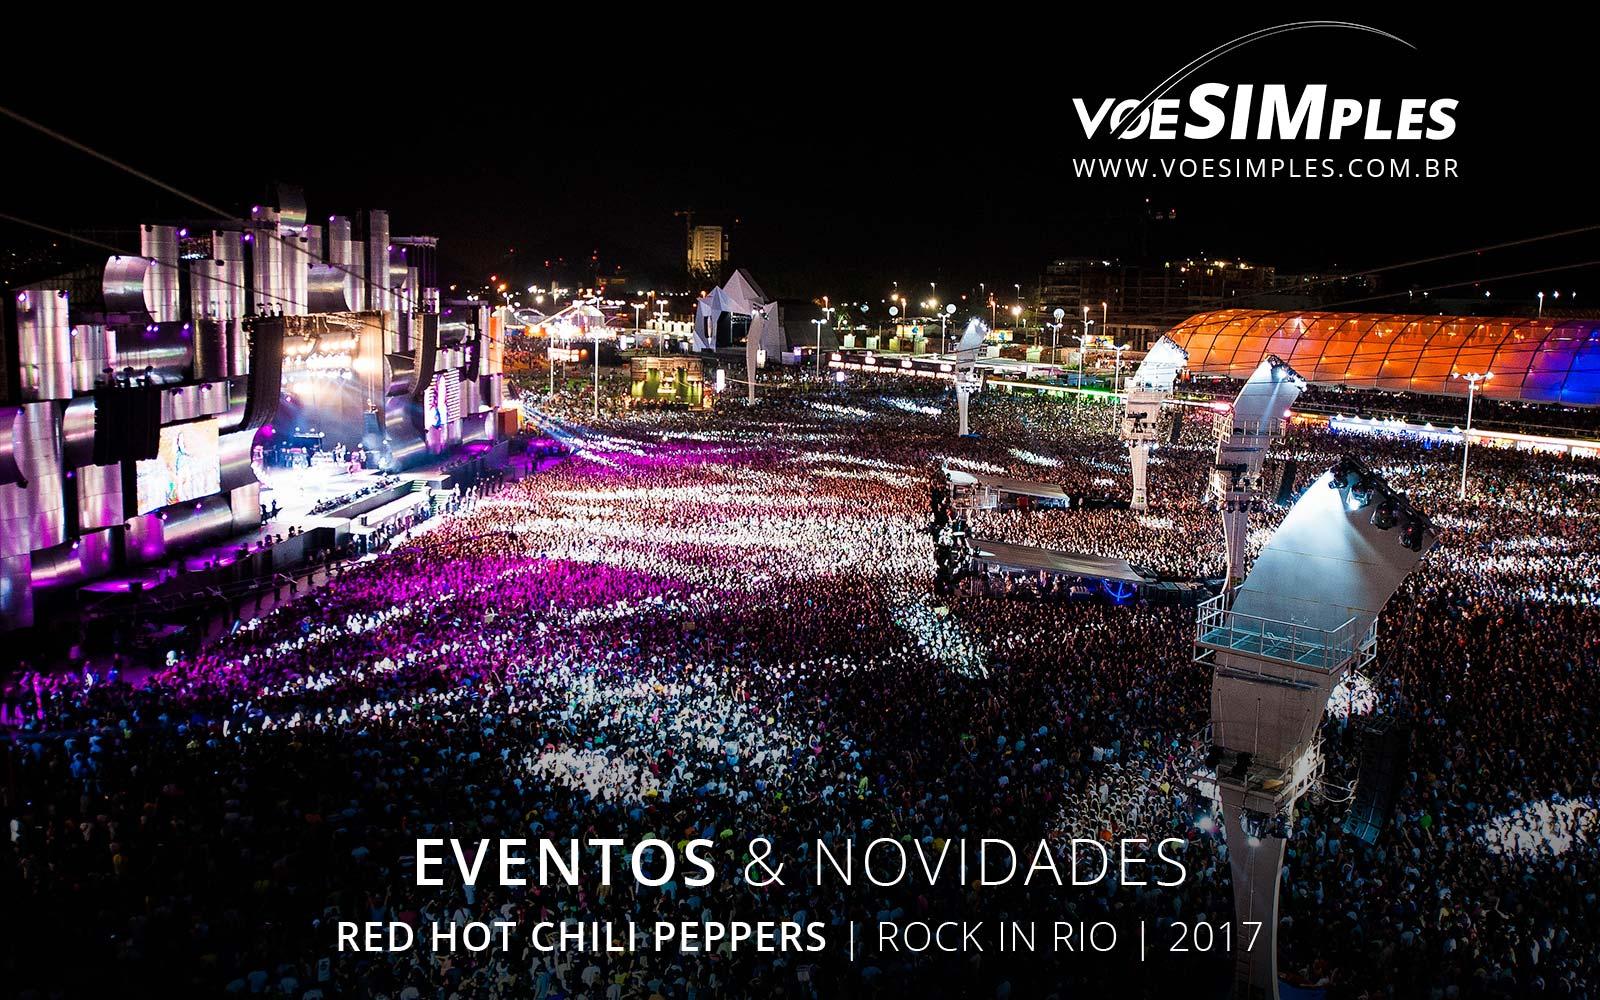 fotos-rock-rio-red-hot-rio-janeiro-2017-voesimples-passagem-aerea-promocional-red-hot-promocao-passagens-aereas-red-hot-2017-03